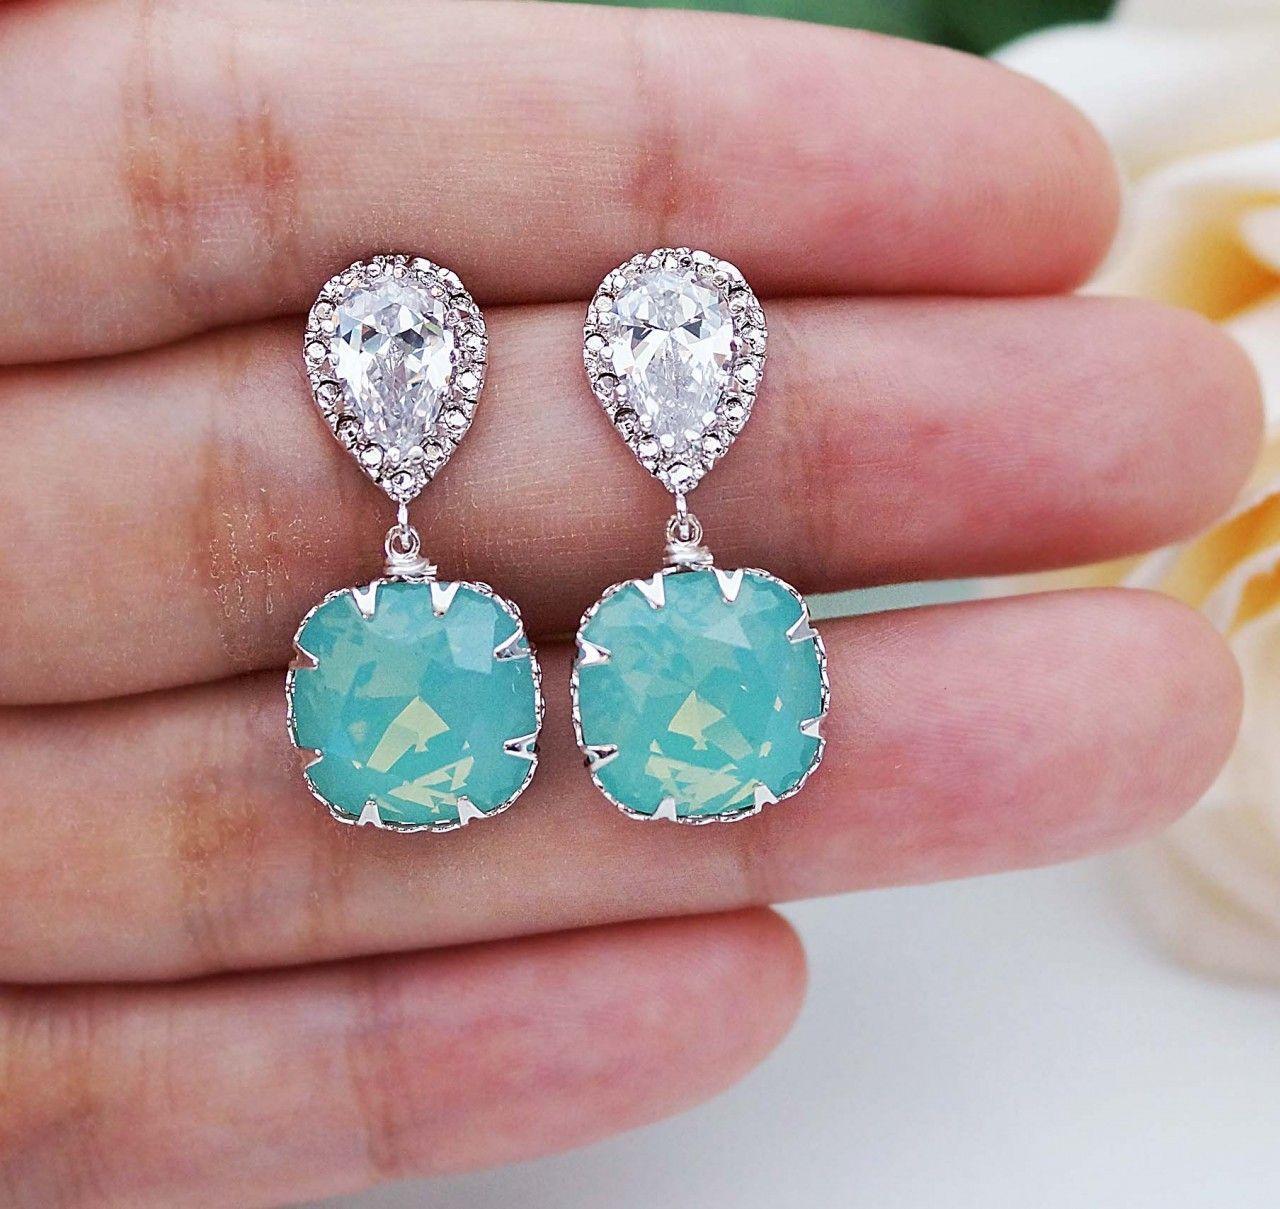 Sea Foam Mint Pacific Opal Swarovski Square Crystal Jewelry Set - Earrings Nation